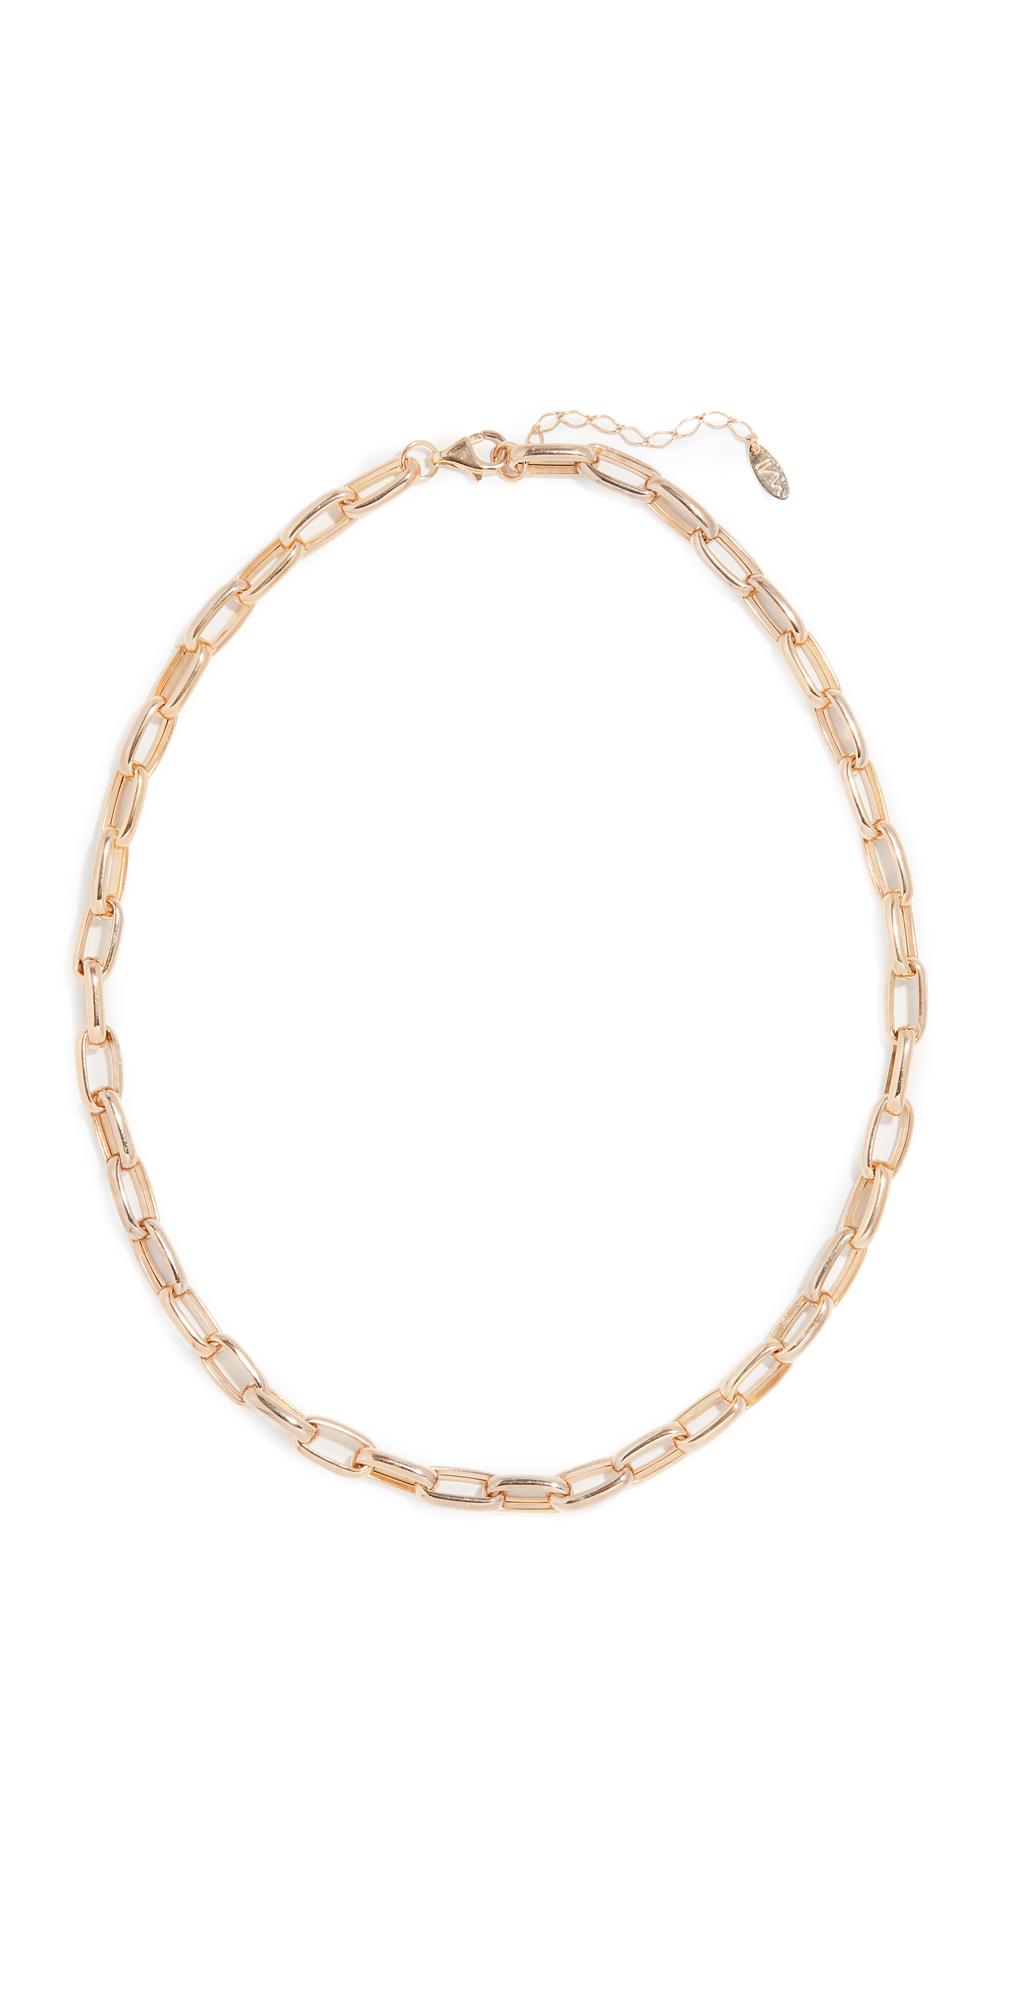 Chunky Chain Choker Necklace